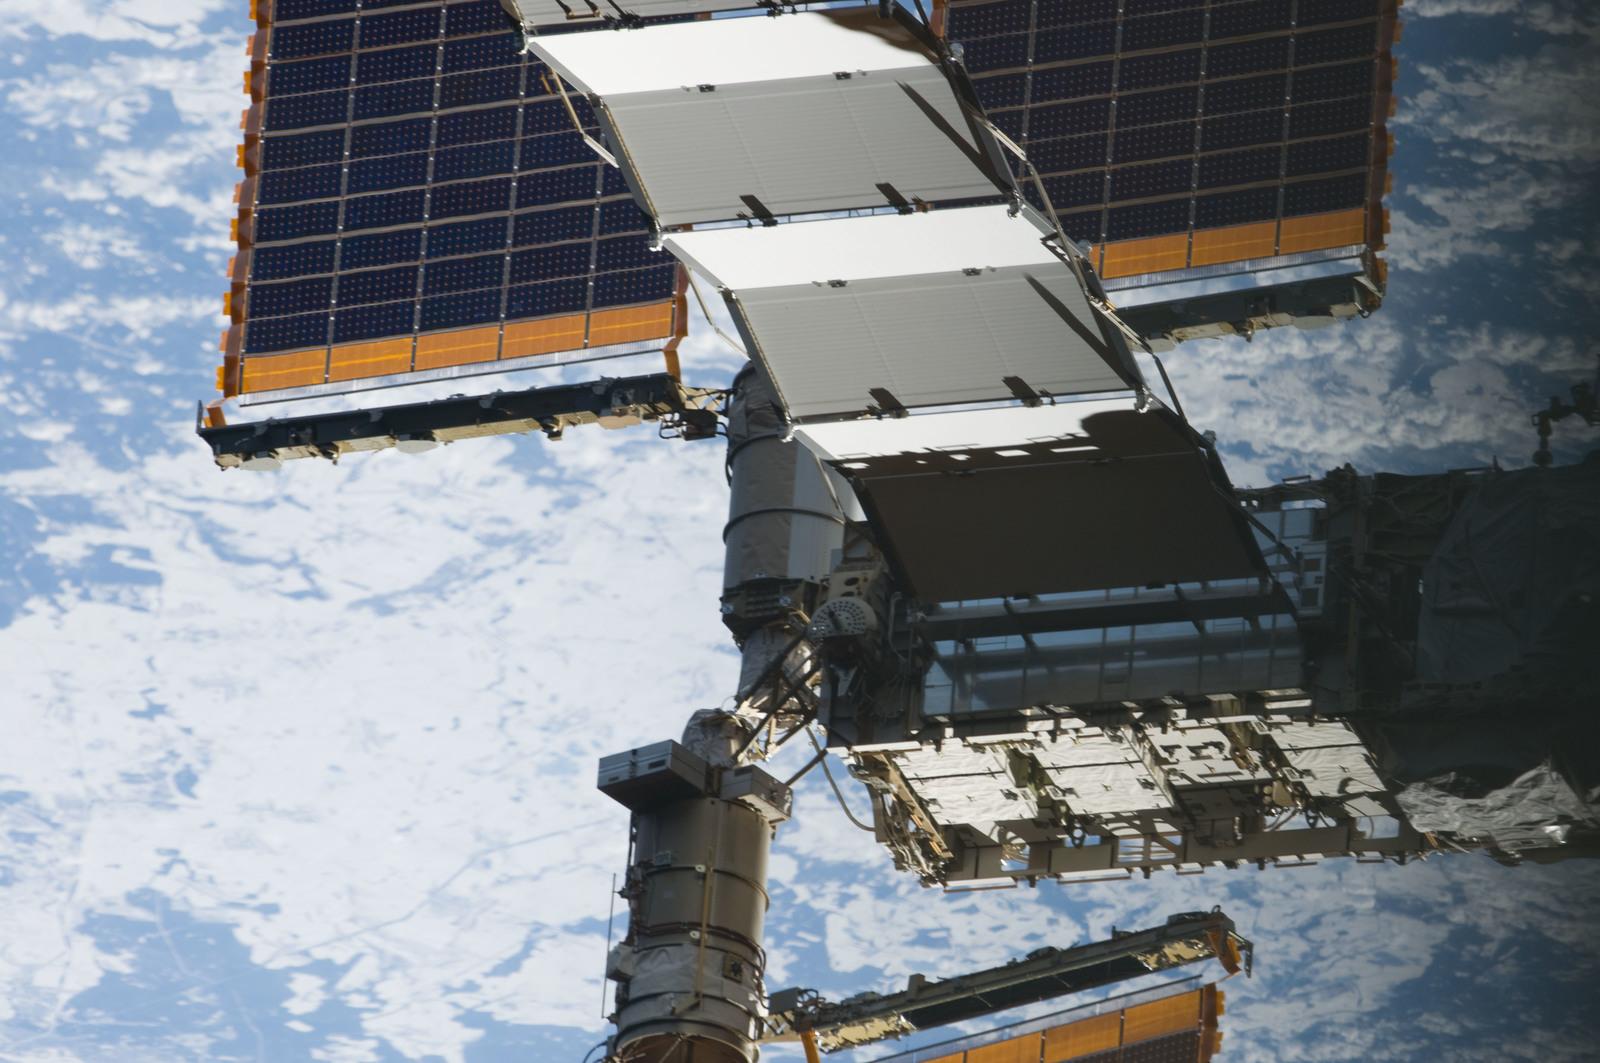 s133E011559 - STS-133 - Solar Arrays